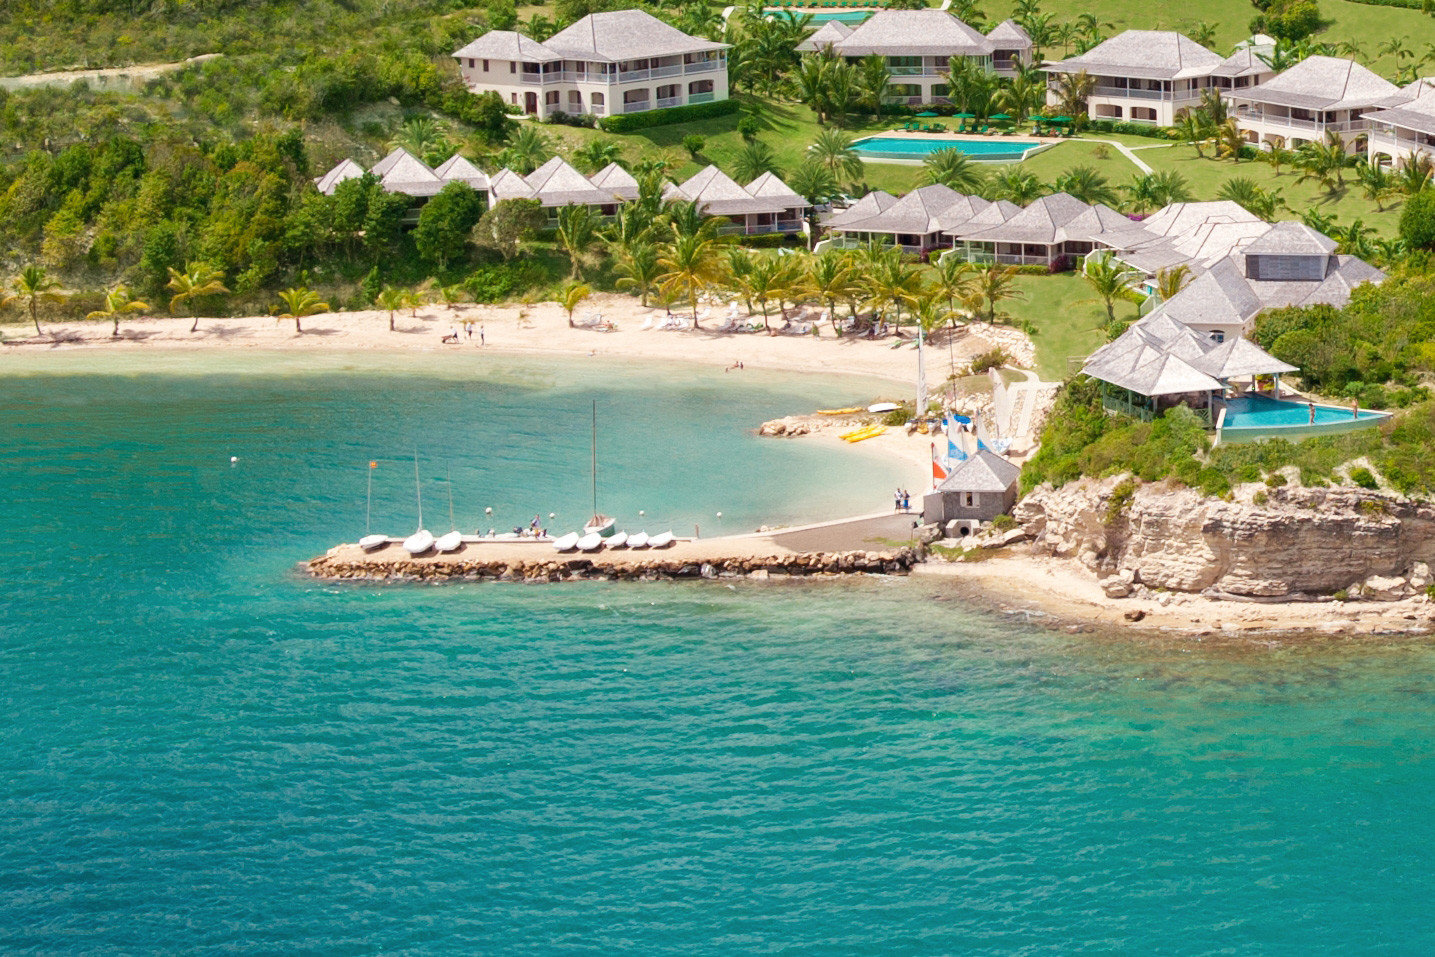 Beachfront Hotels Resort Scenic views Trip Ideas water Nature Sea caribbean swimming pool Beach islet Lagoon Coast Island cape cove Water park swimming shore